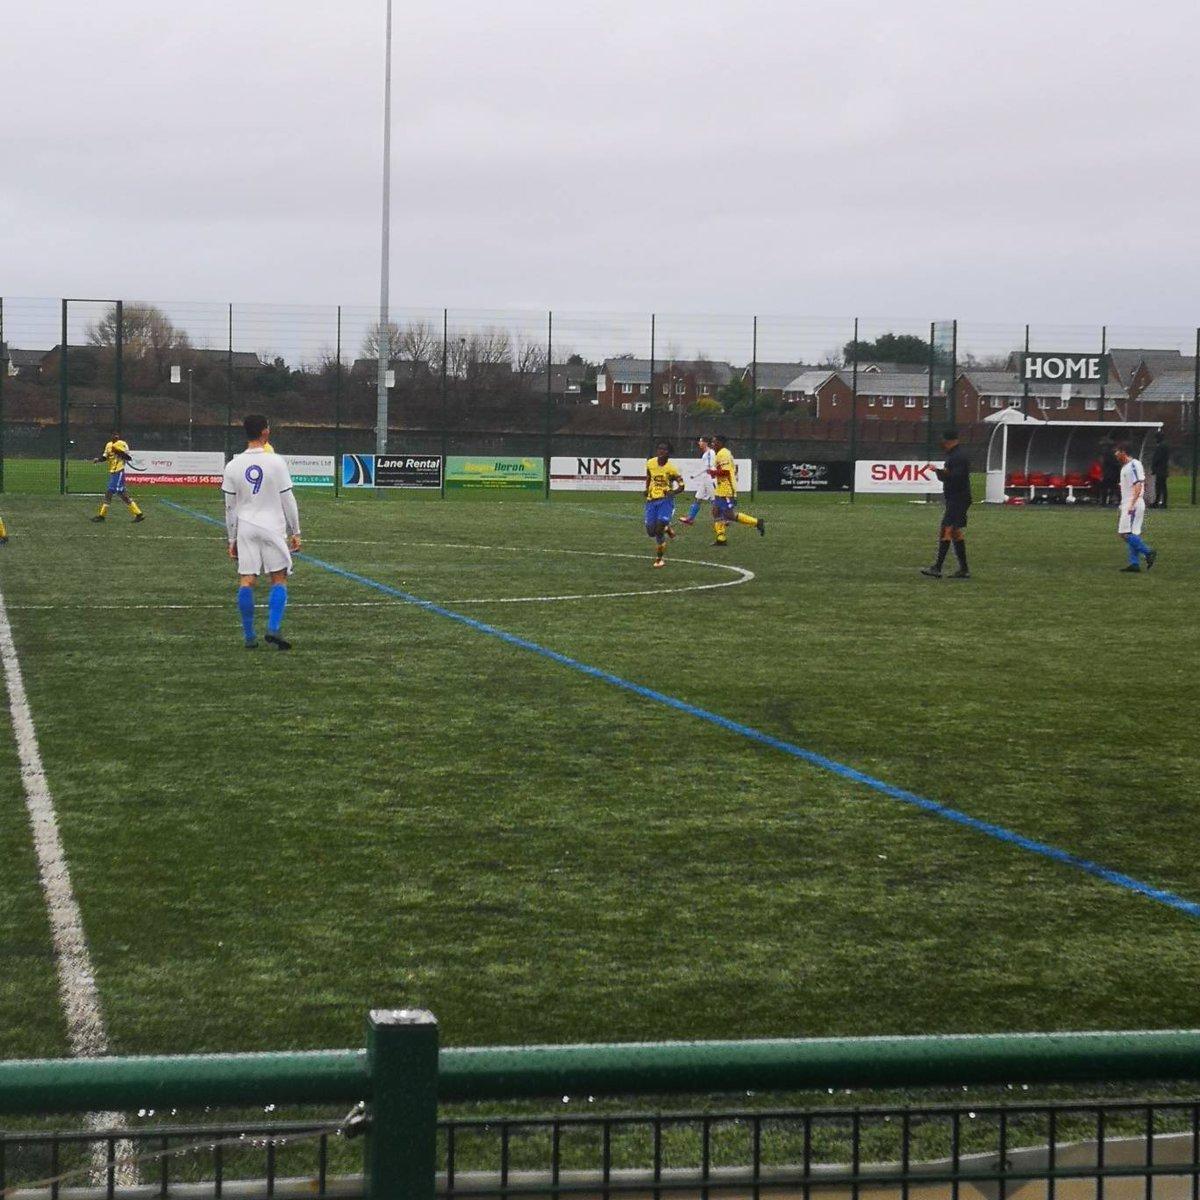 Goal | Warrington get a goal back  4-1  #TRFC #SWA<br>http://pic.twitter.com/hWRYXshrQ9